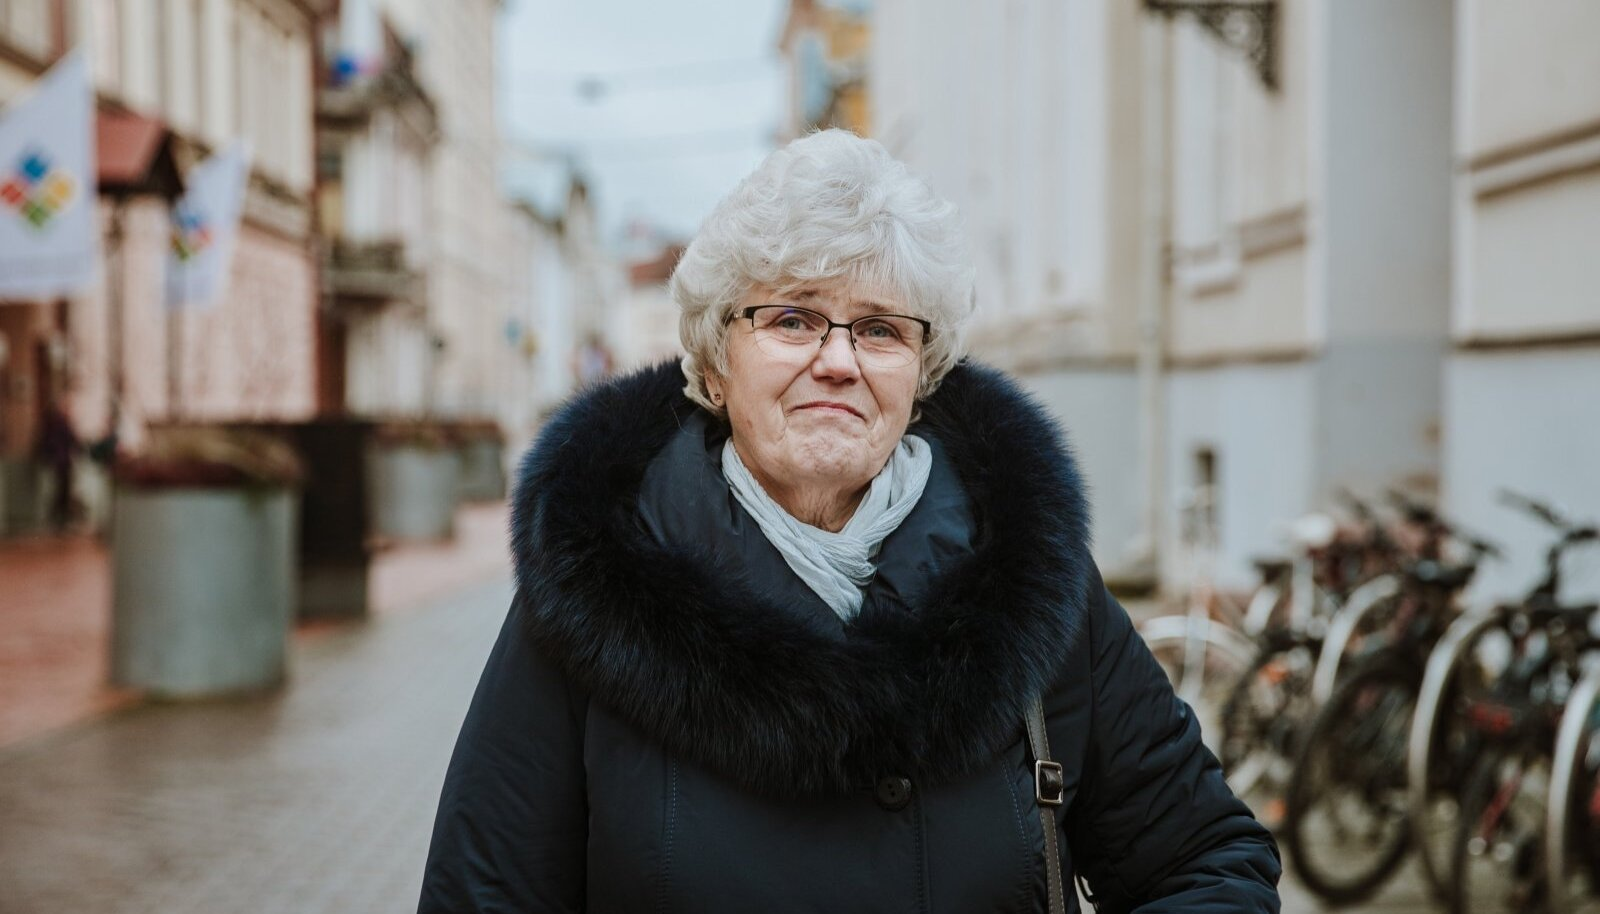 Iivi Luik